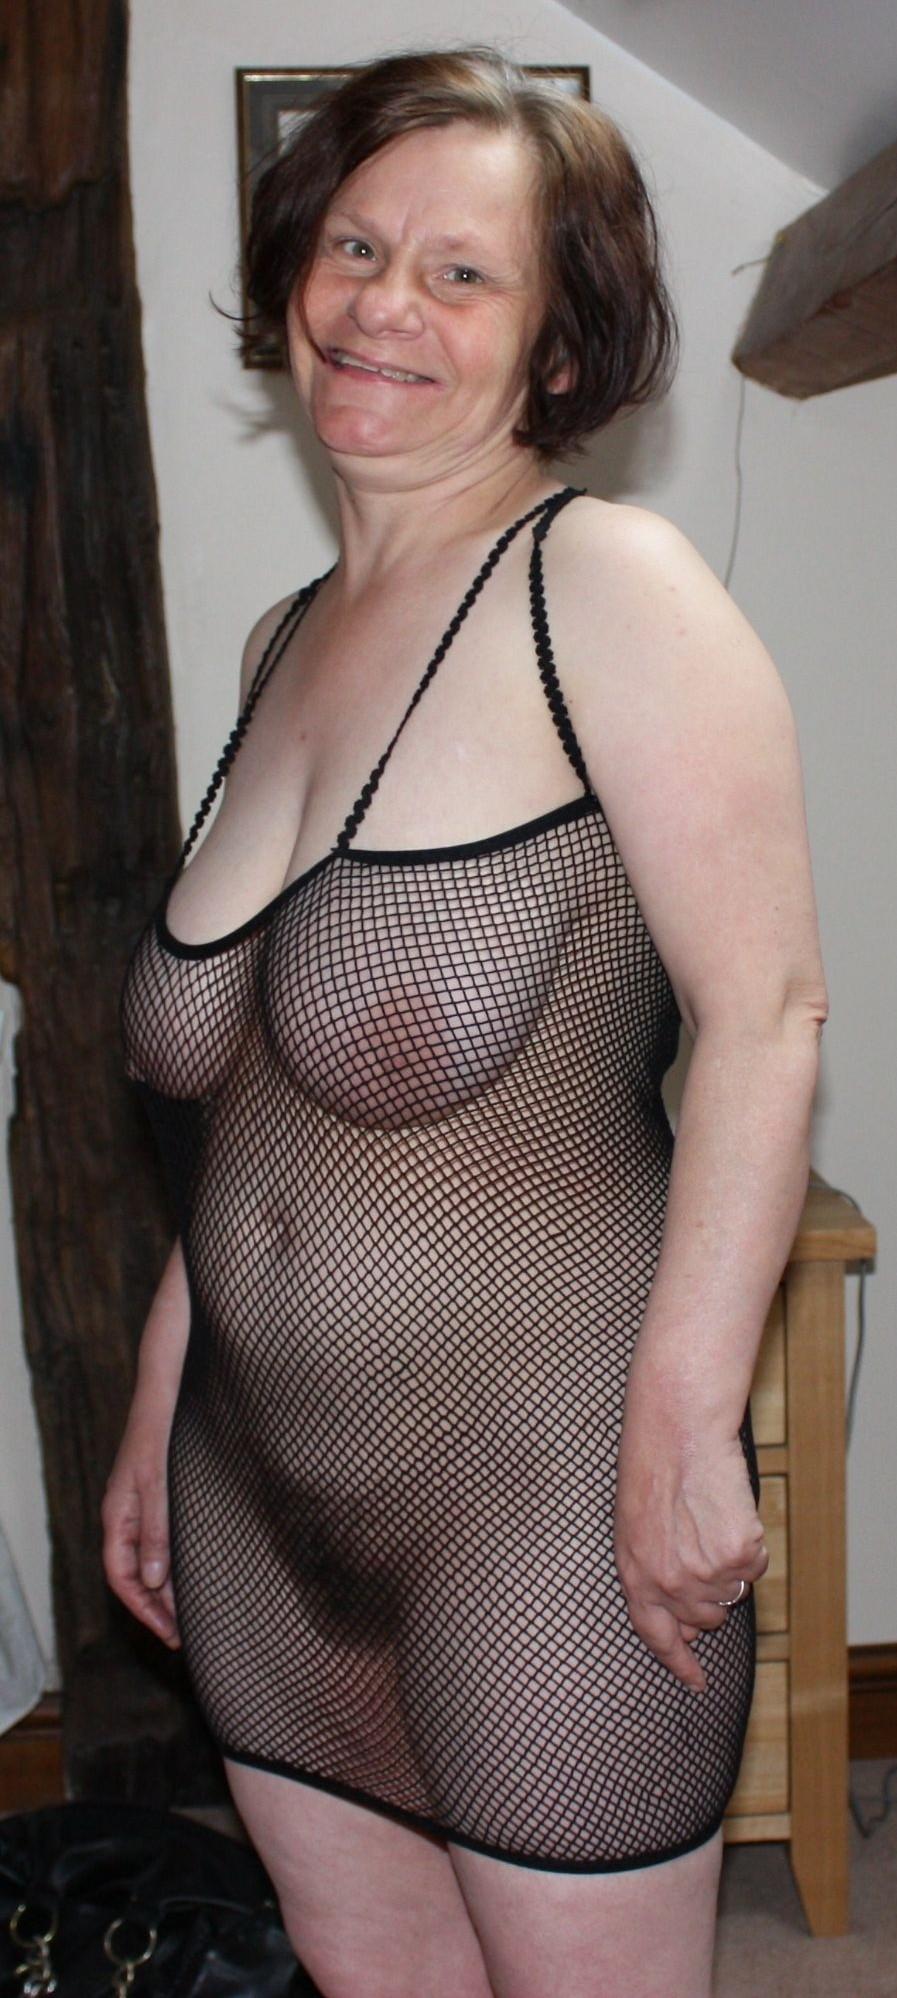 gamla svenska porrfilmer mogna kvinnor nakna